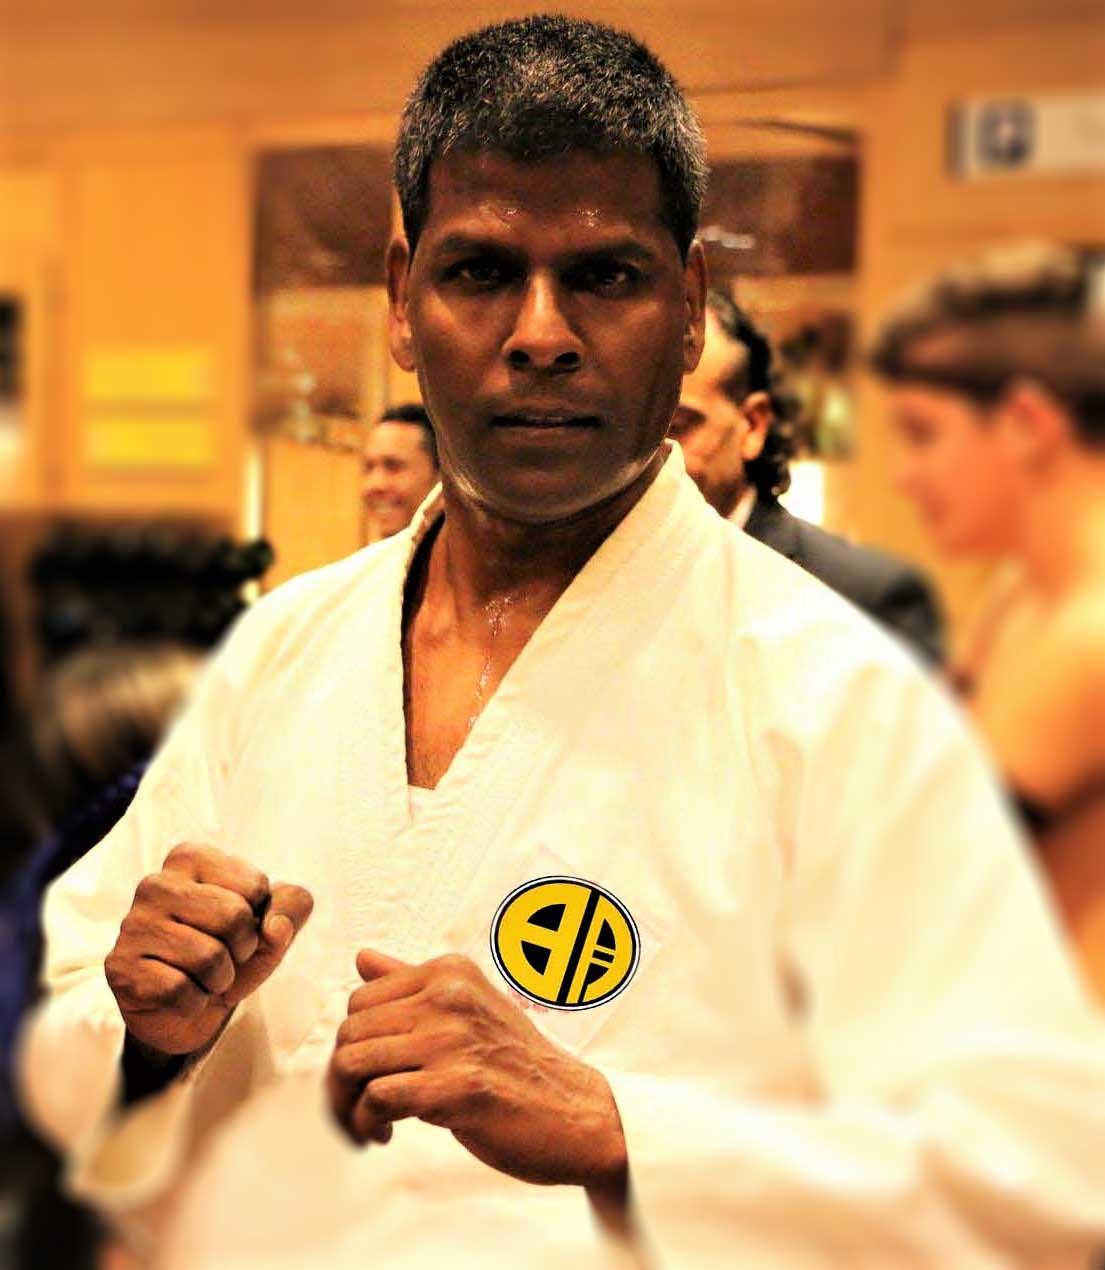 VINOD KUMAR-CHIEF INSTRUCTOR & DIRECTOR INDIA